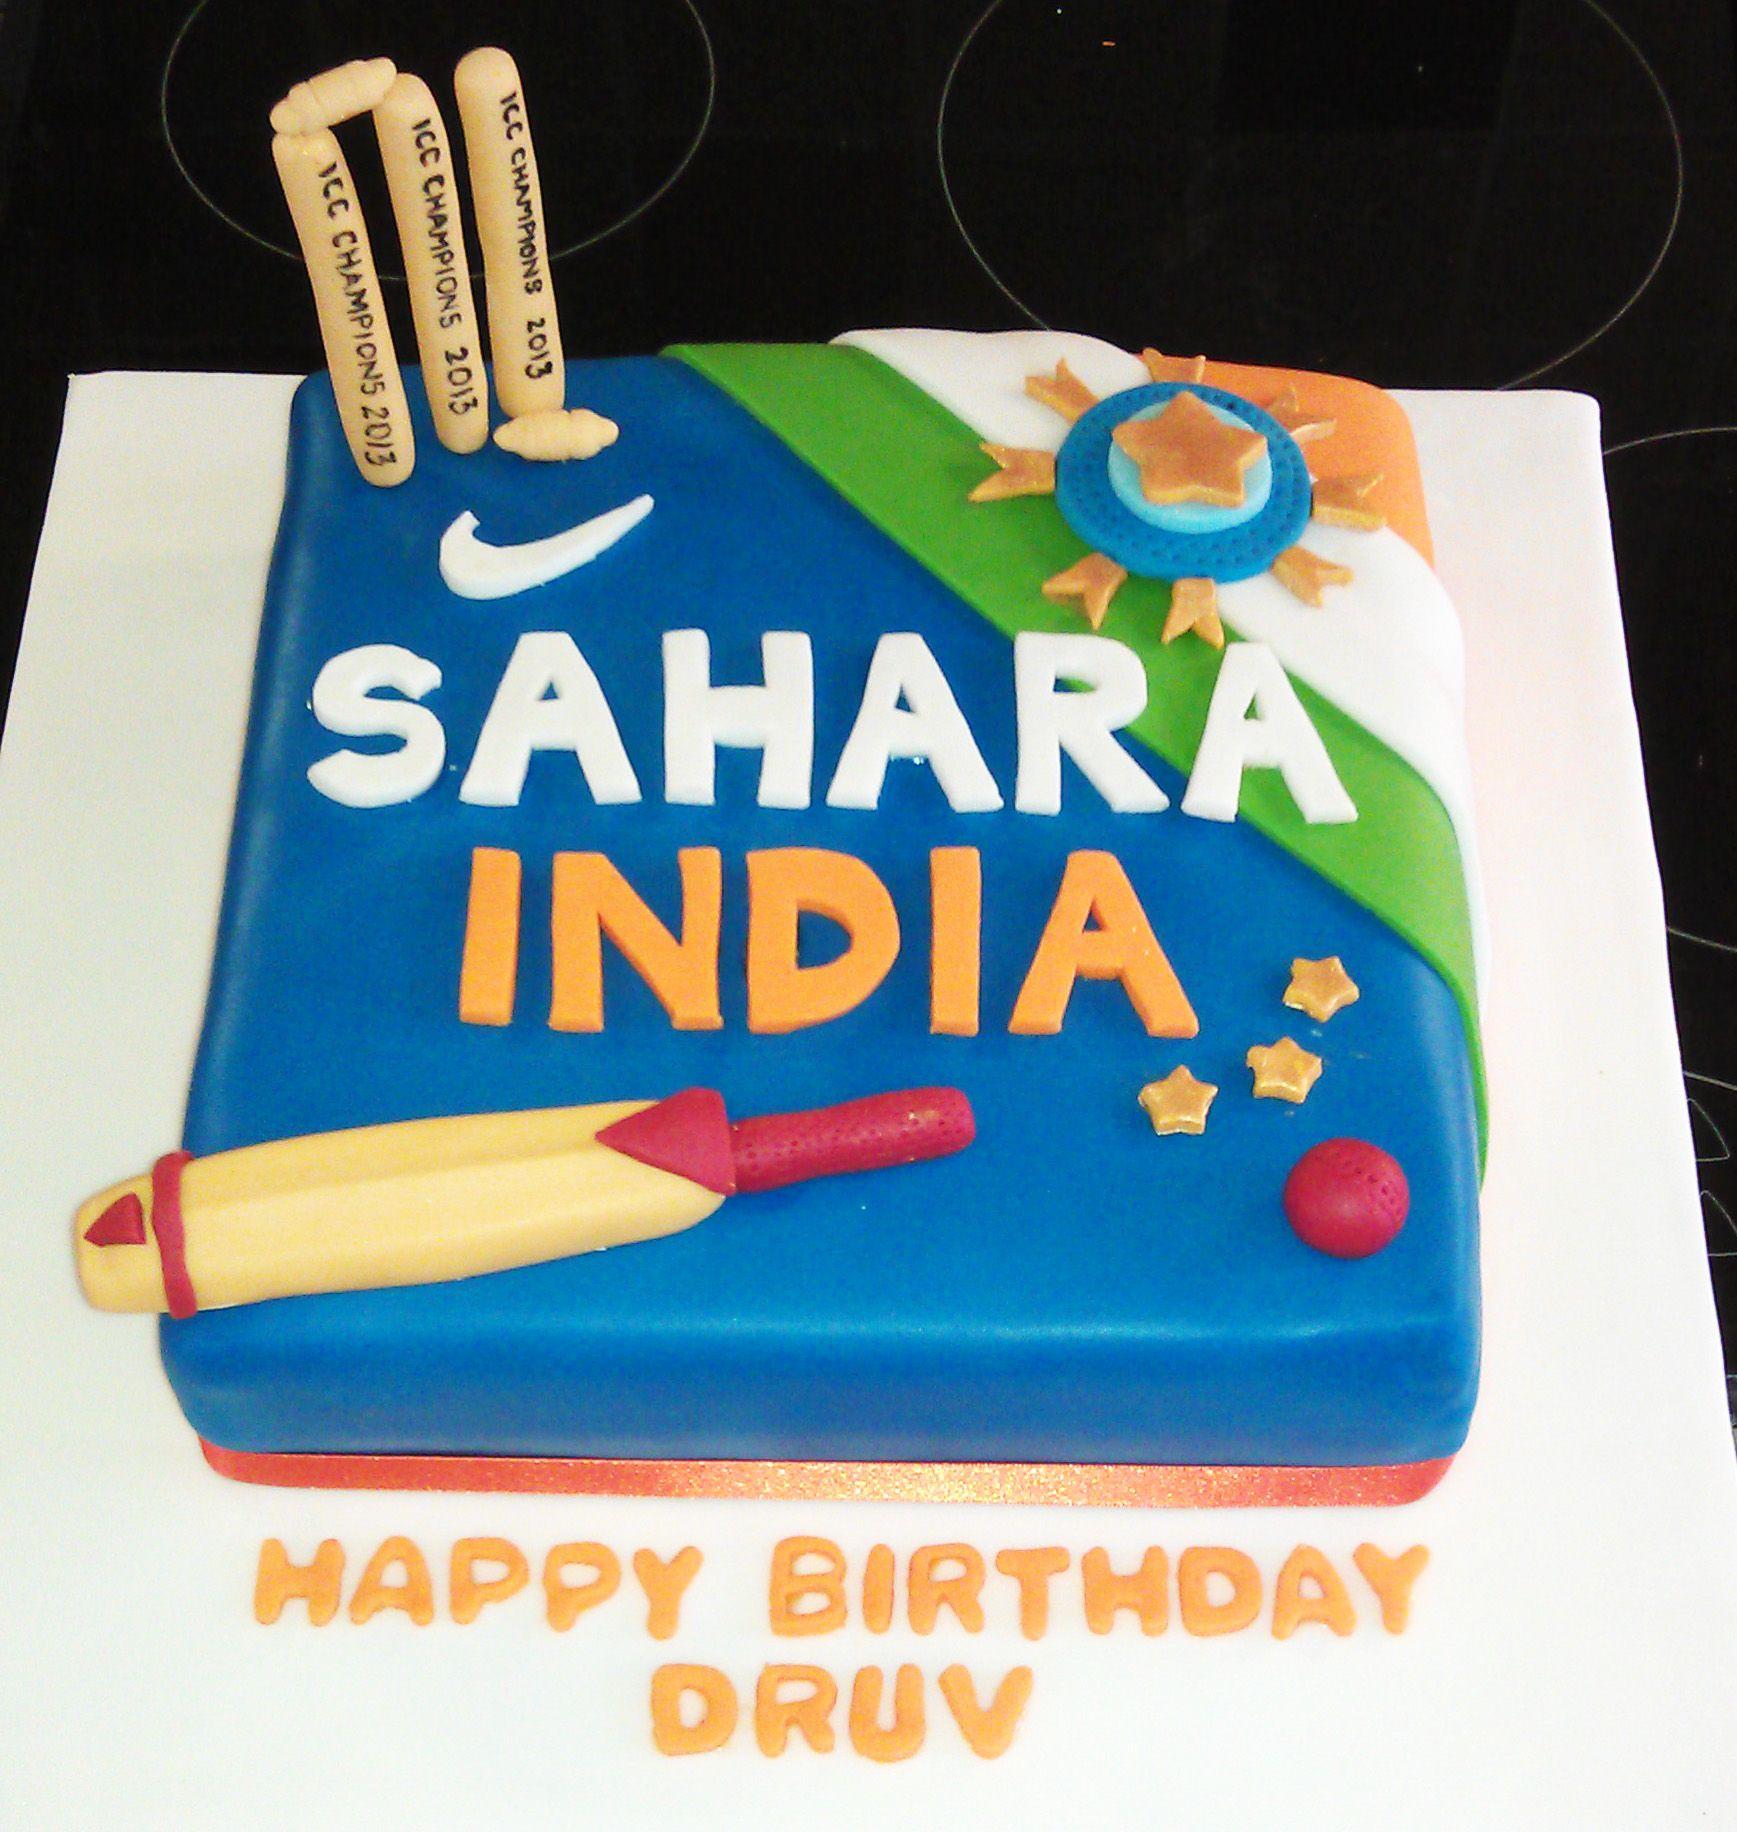 Swell India Cricket Cake With Images Cricket Cake Cricket Birthday Funny Birthday Cards Online Elaedamsfinfo